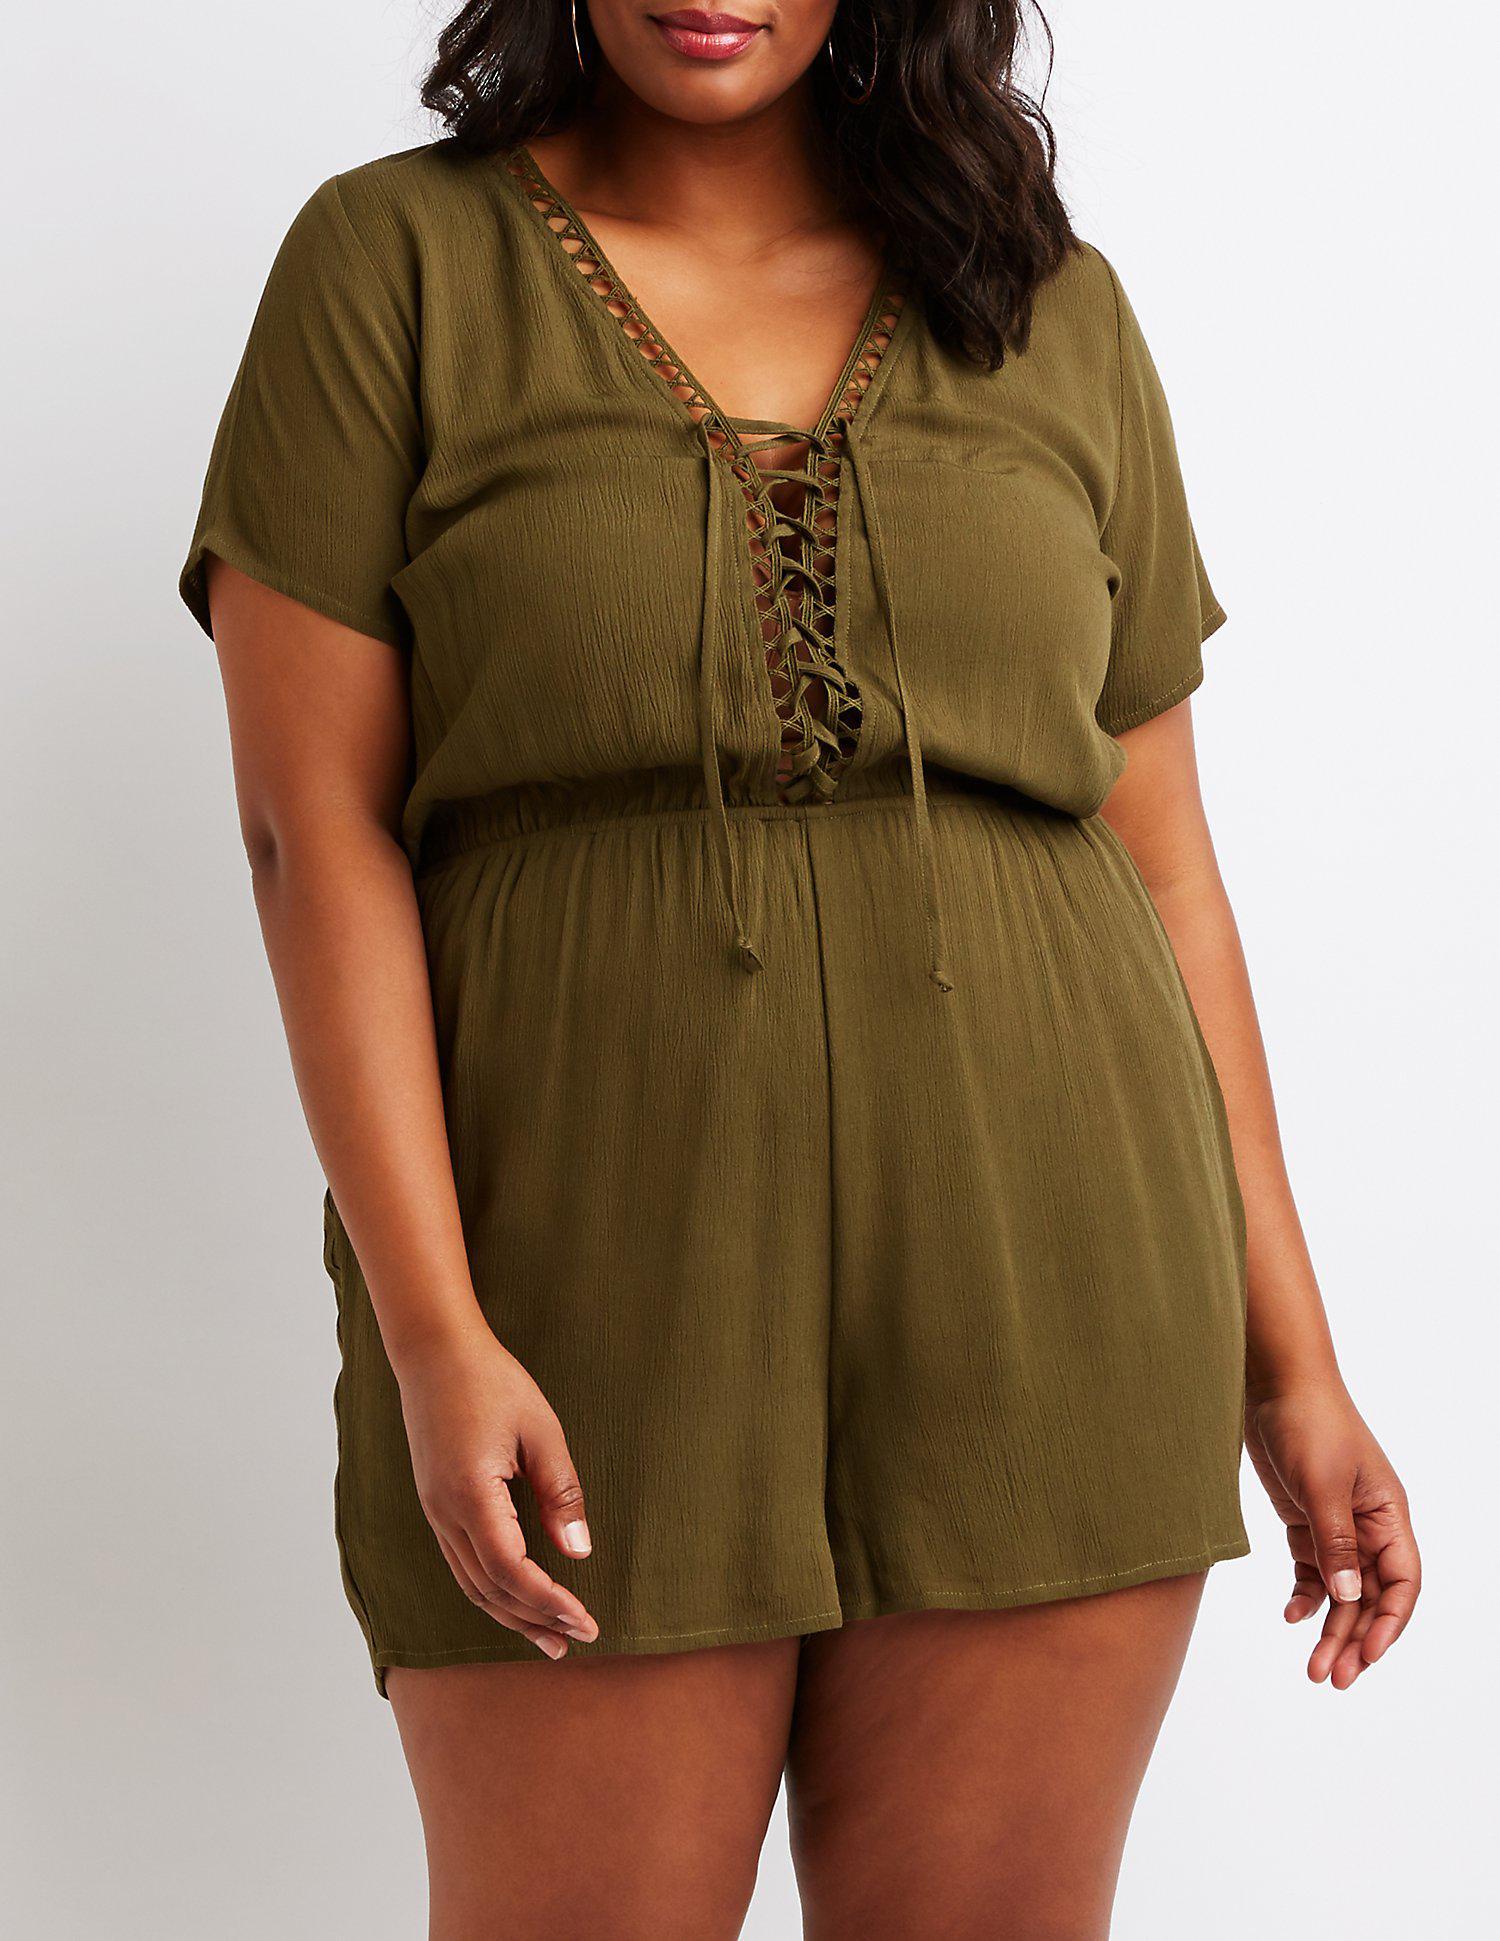 cffd68da2de Lyst - Charlotte Russe Plus Size Crochet Lace Up Romper in Green